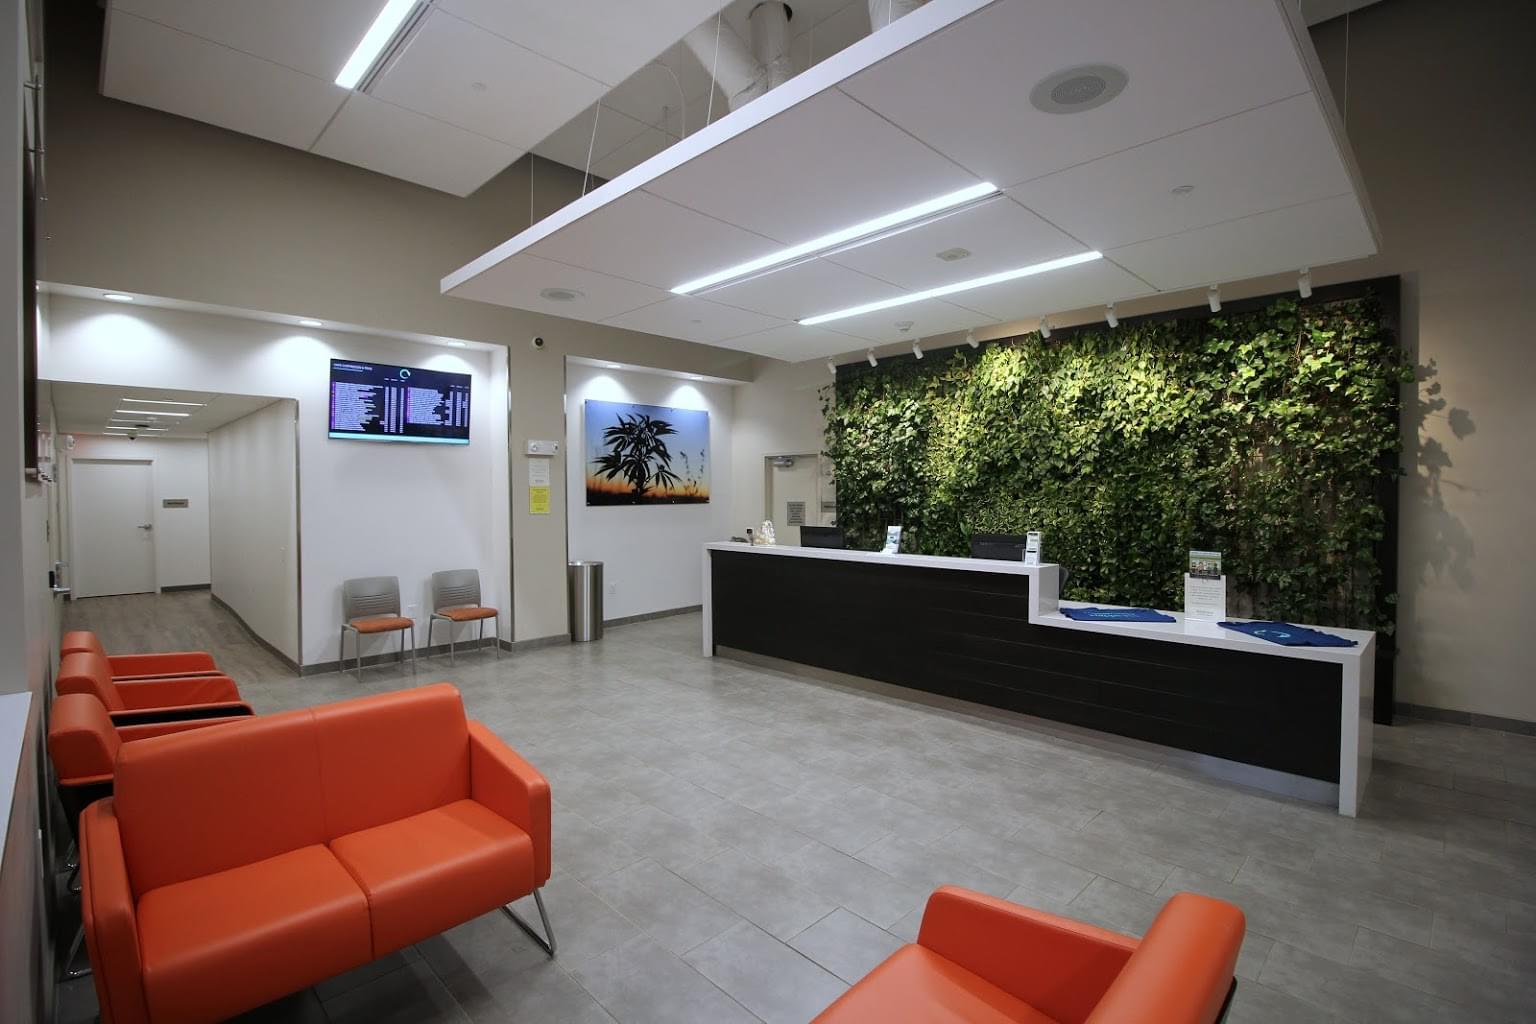 Restore Integrative Wellness Center medical marijuana dispensary in Frankford, PA